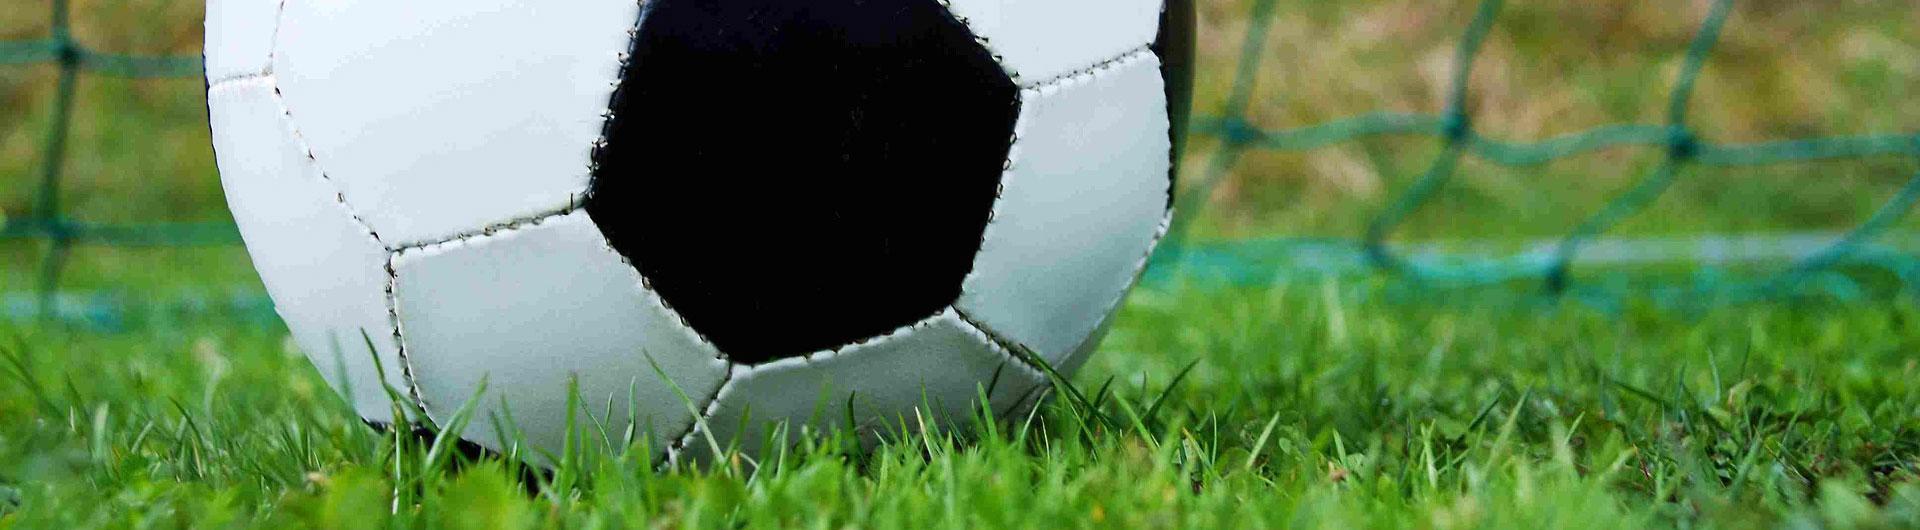 Soccer Ball Mass Youth Referee